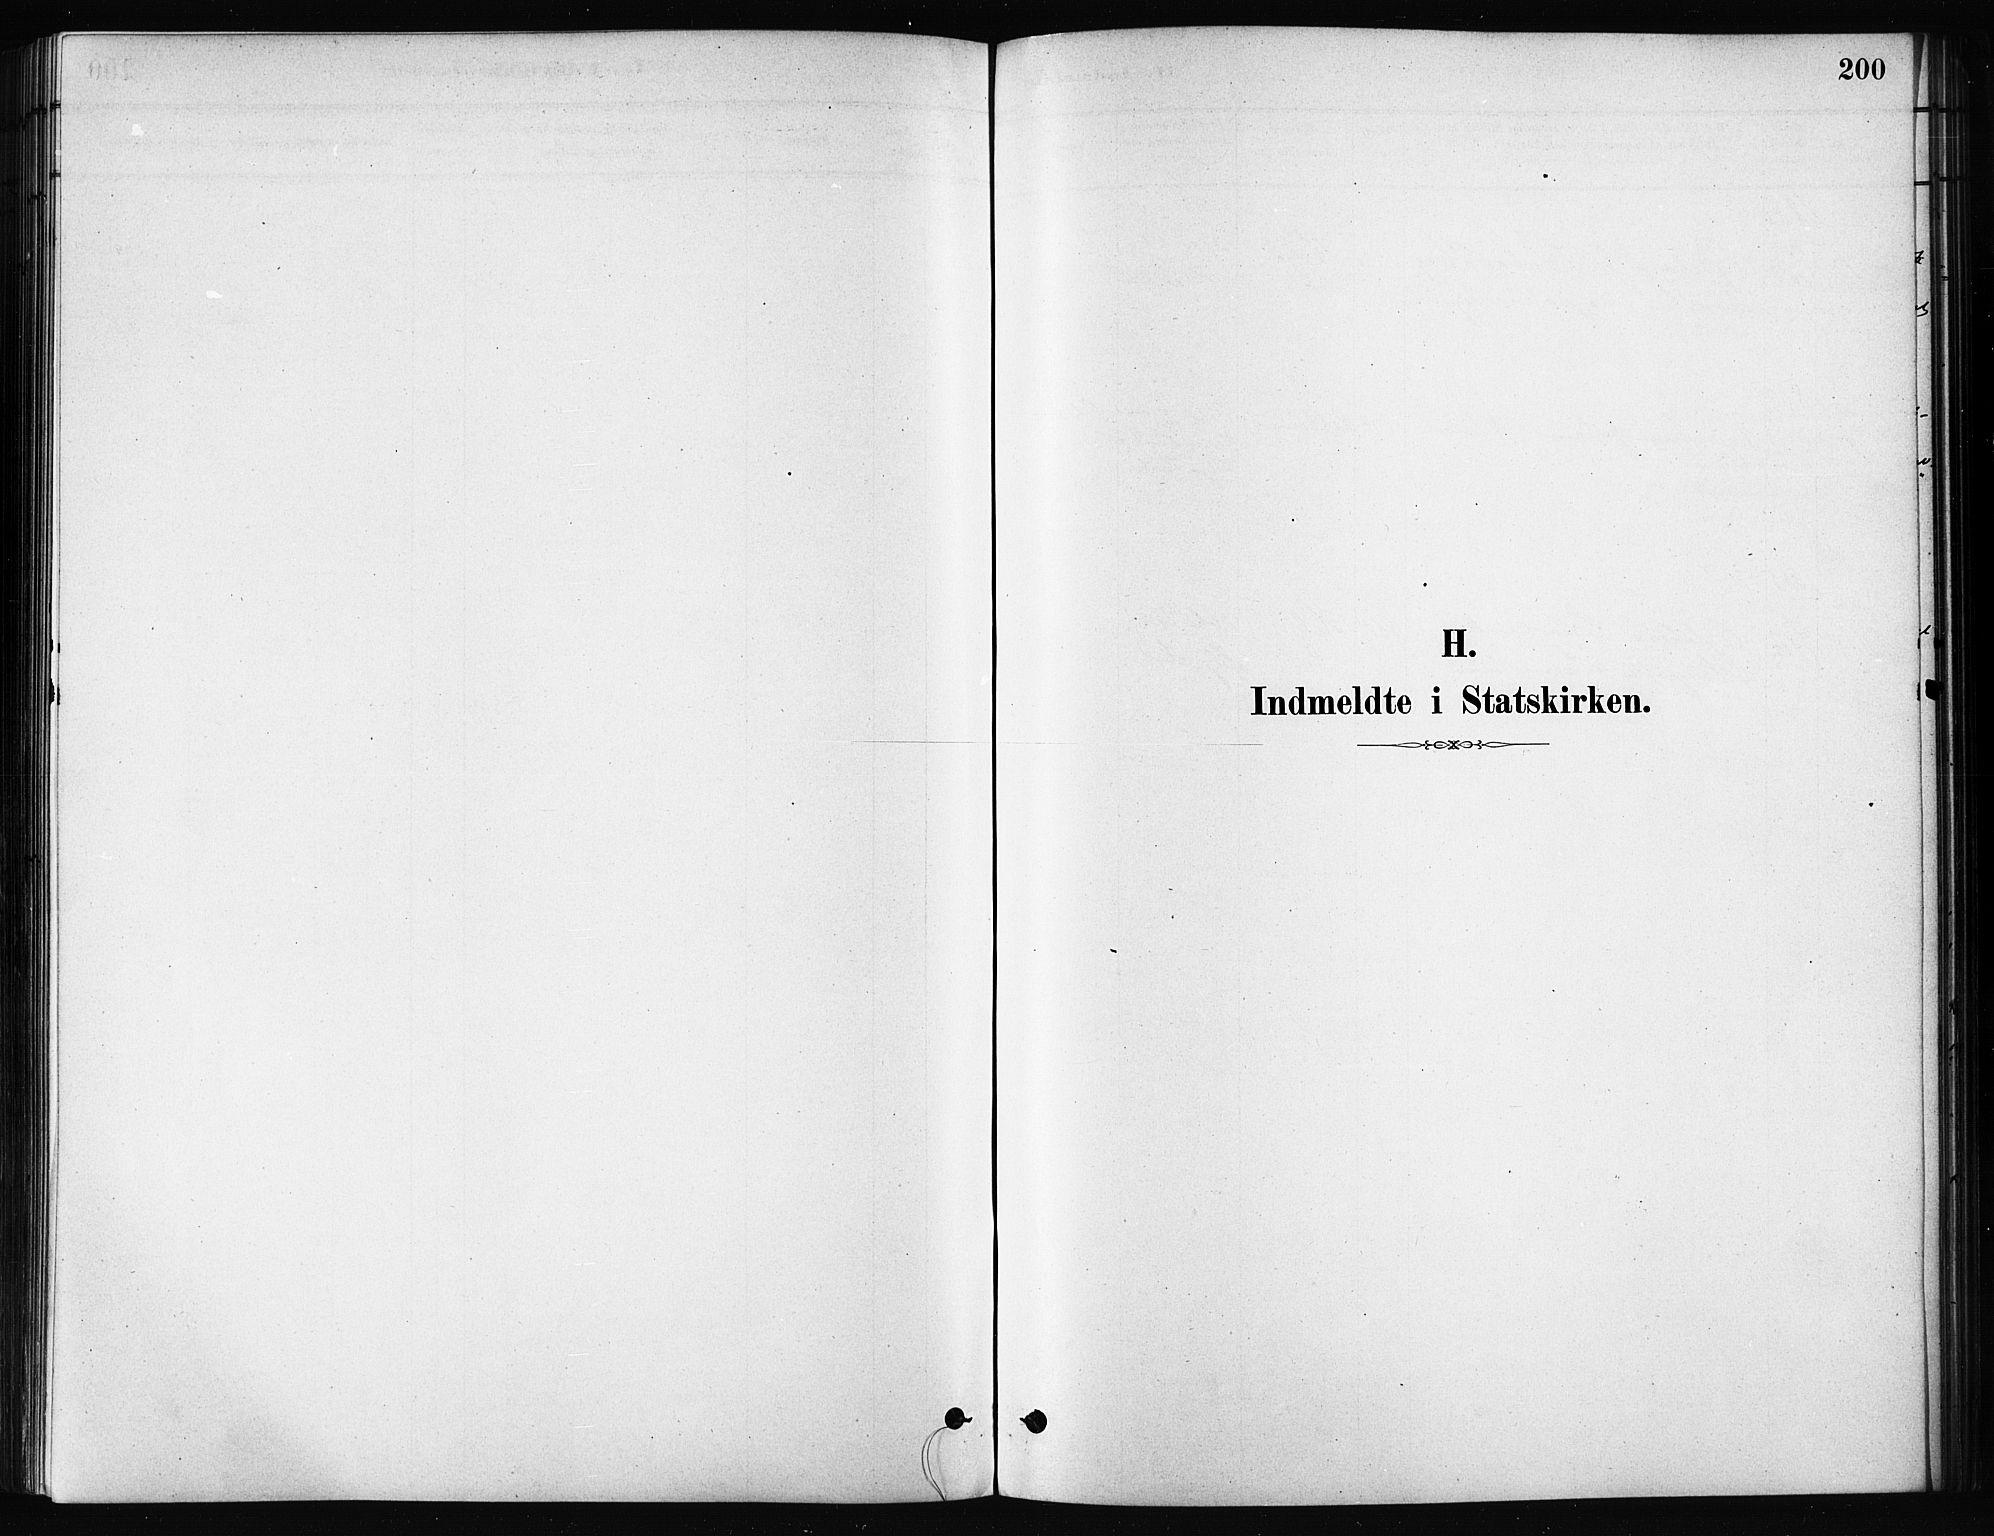 SATØ, Karlsøy sokneprestembete, H/Ha/Haa/L0011kirke: Parish register (official) no. 11, 1879-1892, p. 200